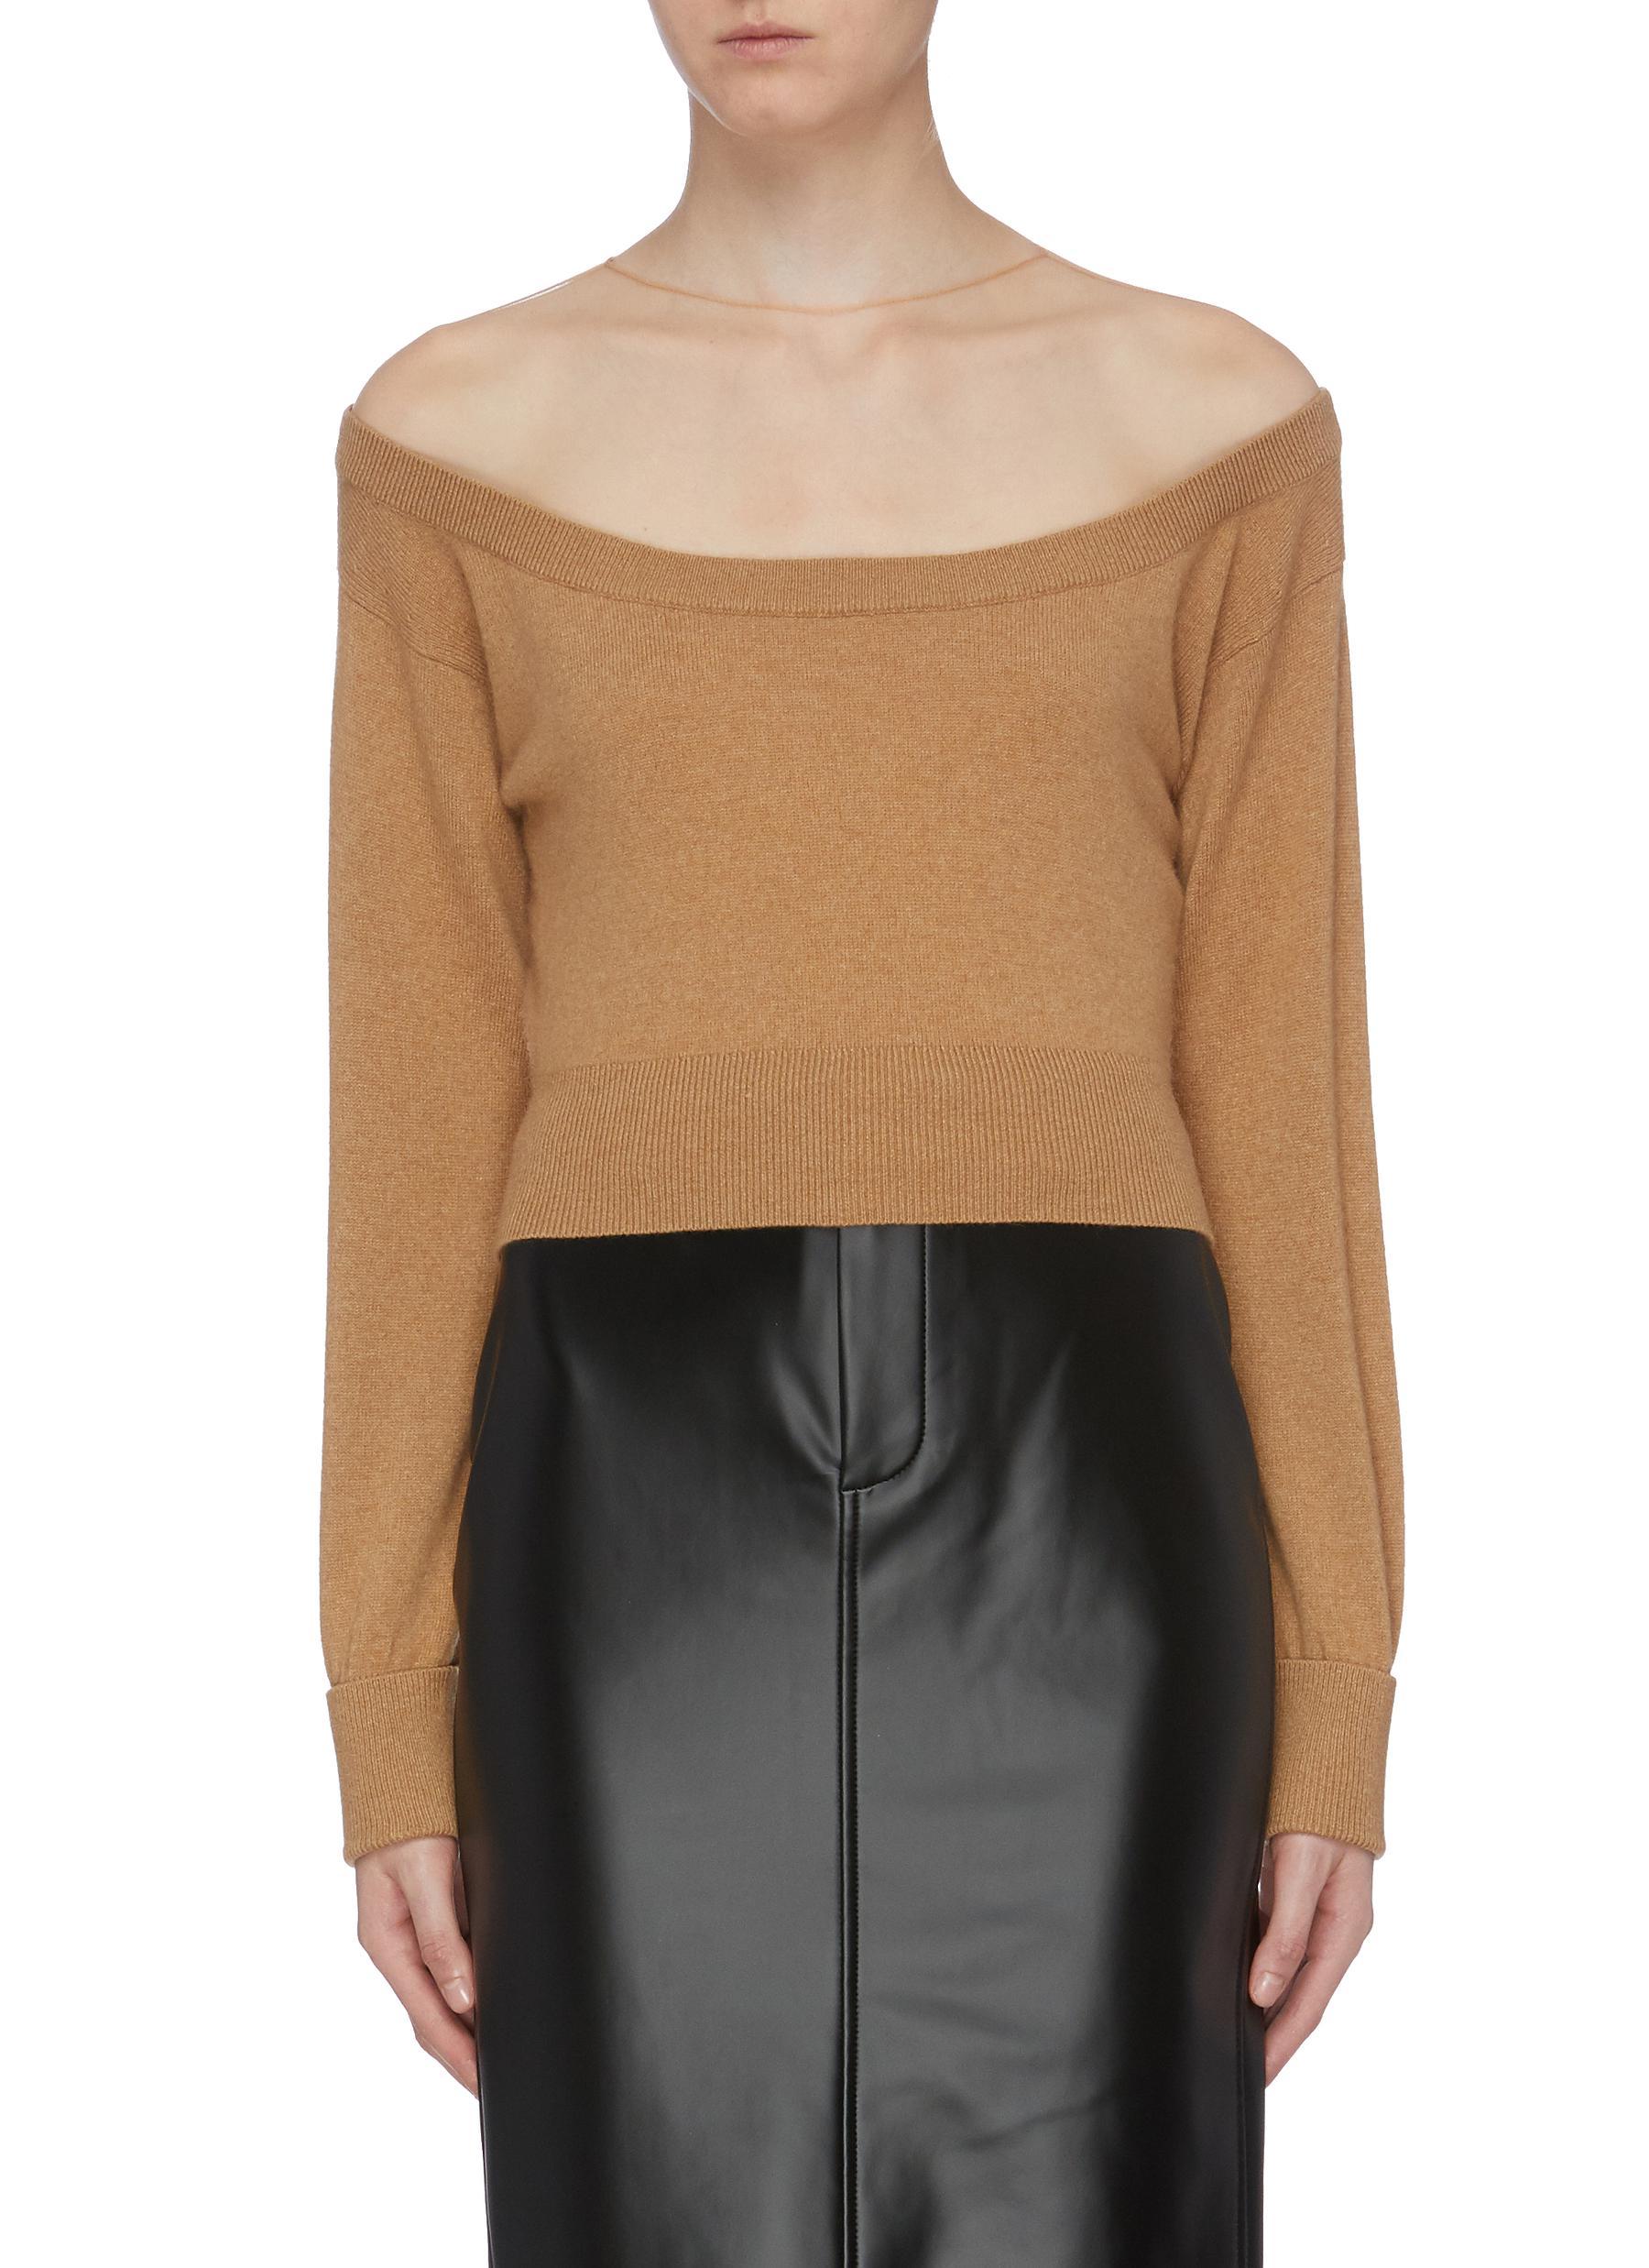 Mesh underlay off-shoulder sweater by Alexanderwang